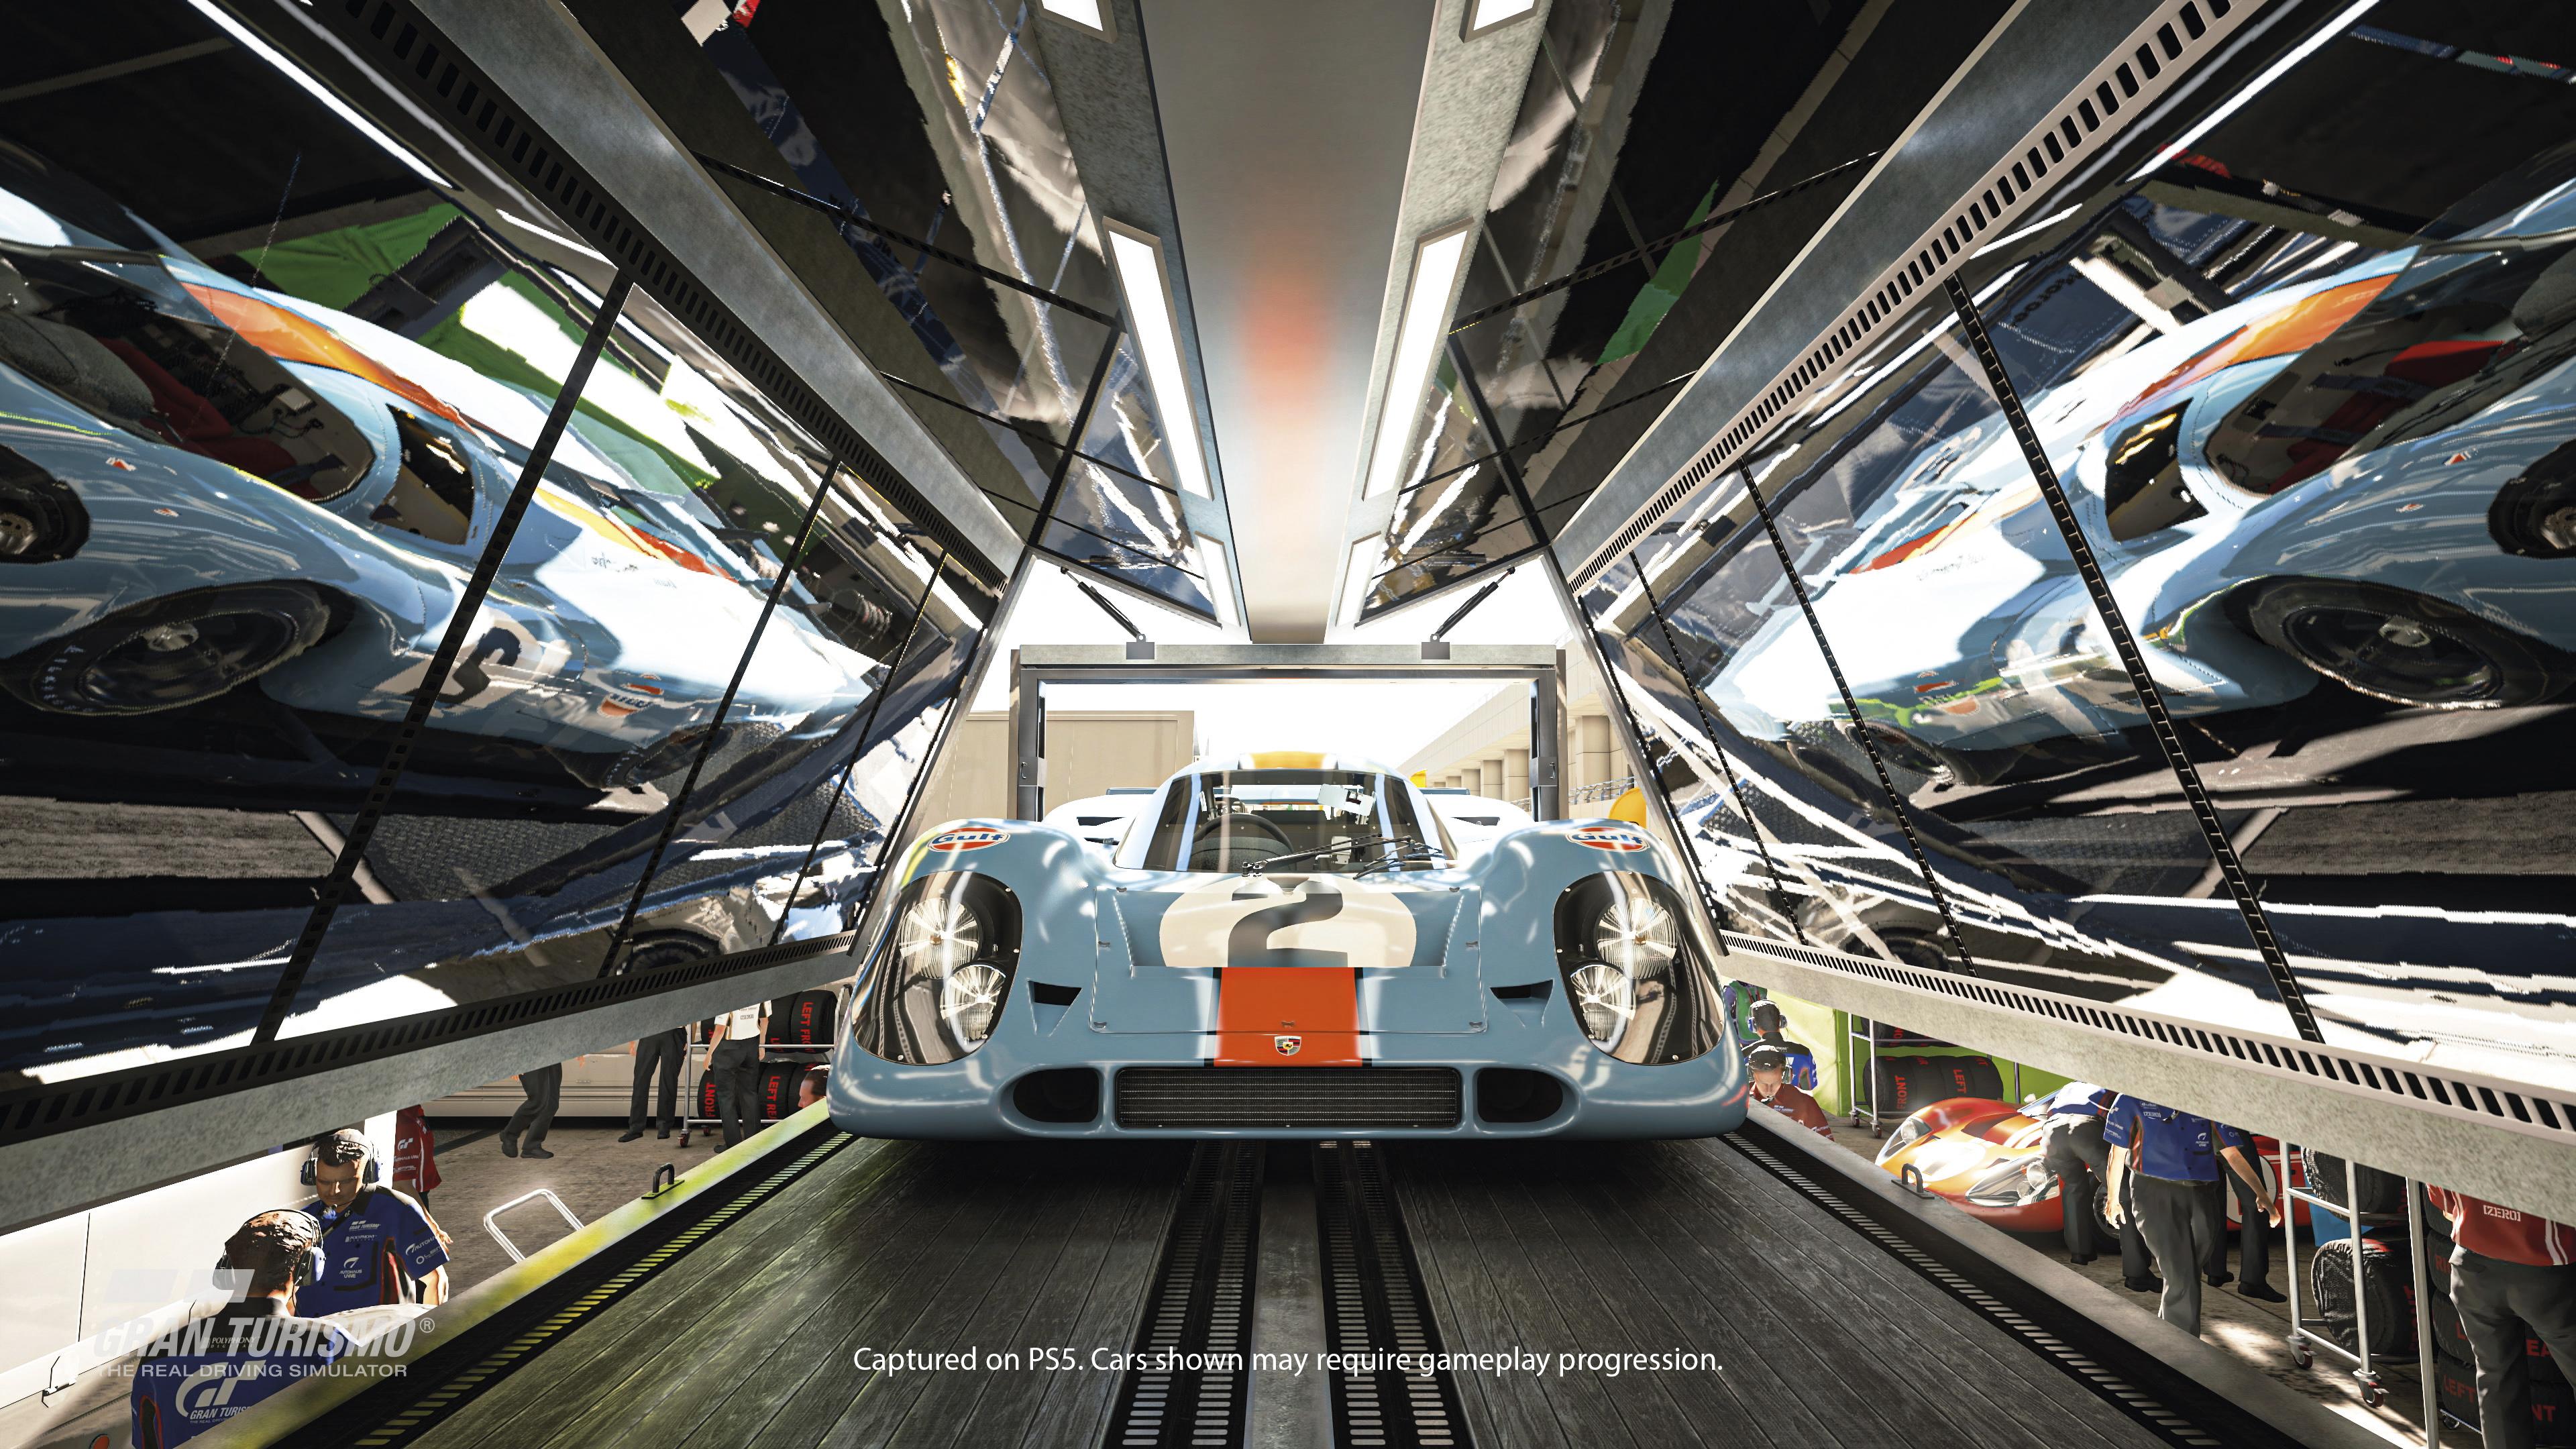 Gran Turismo 7 - PS5 - Wallpapers - 4K